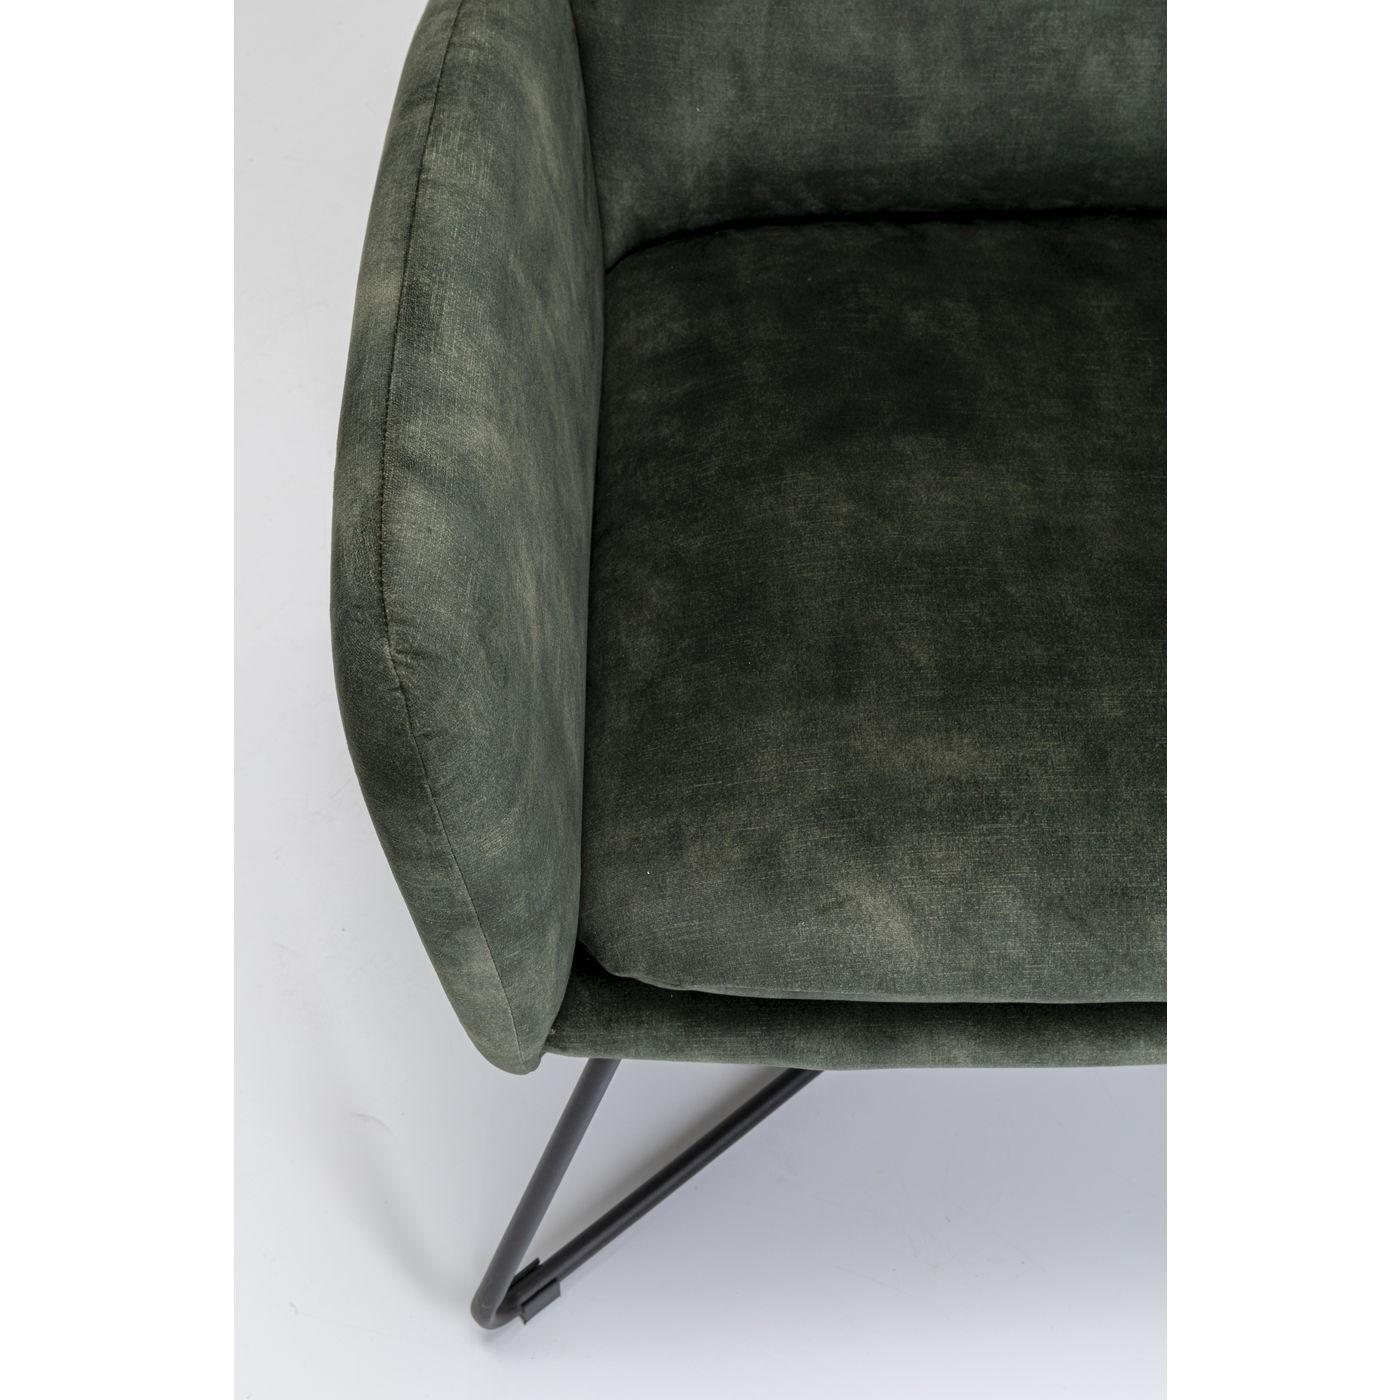 Fauteuil et repose-pieds Leeds Kare Design